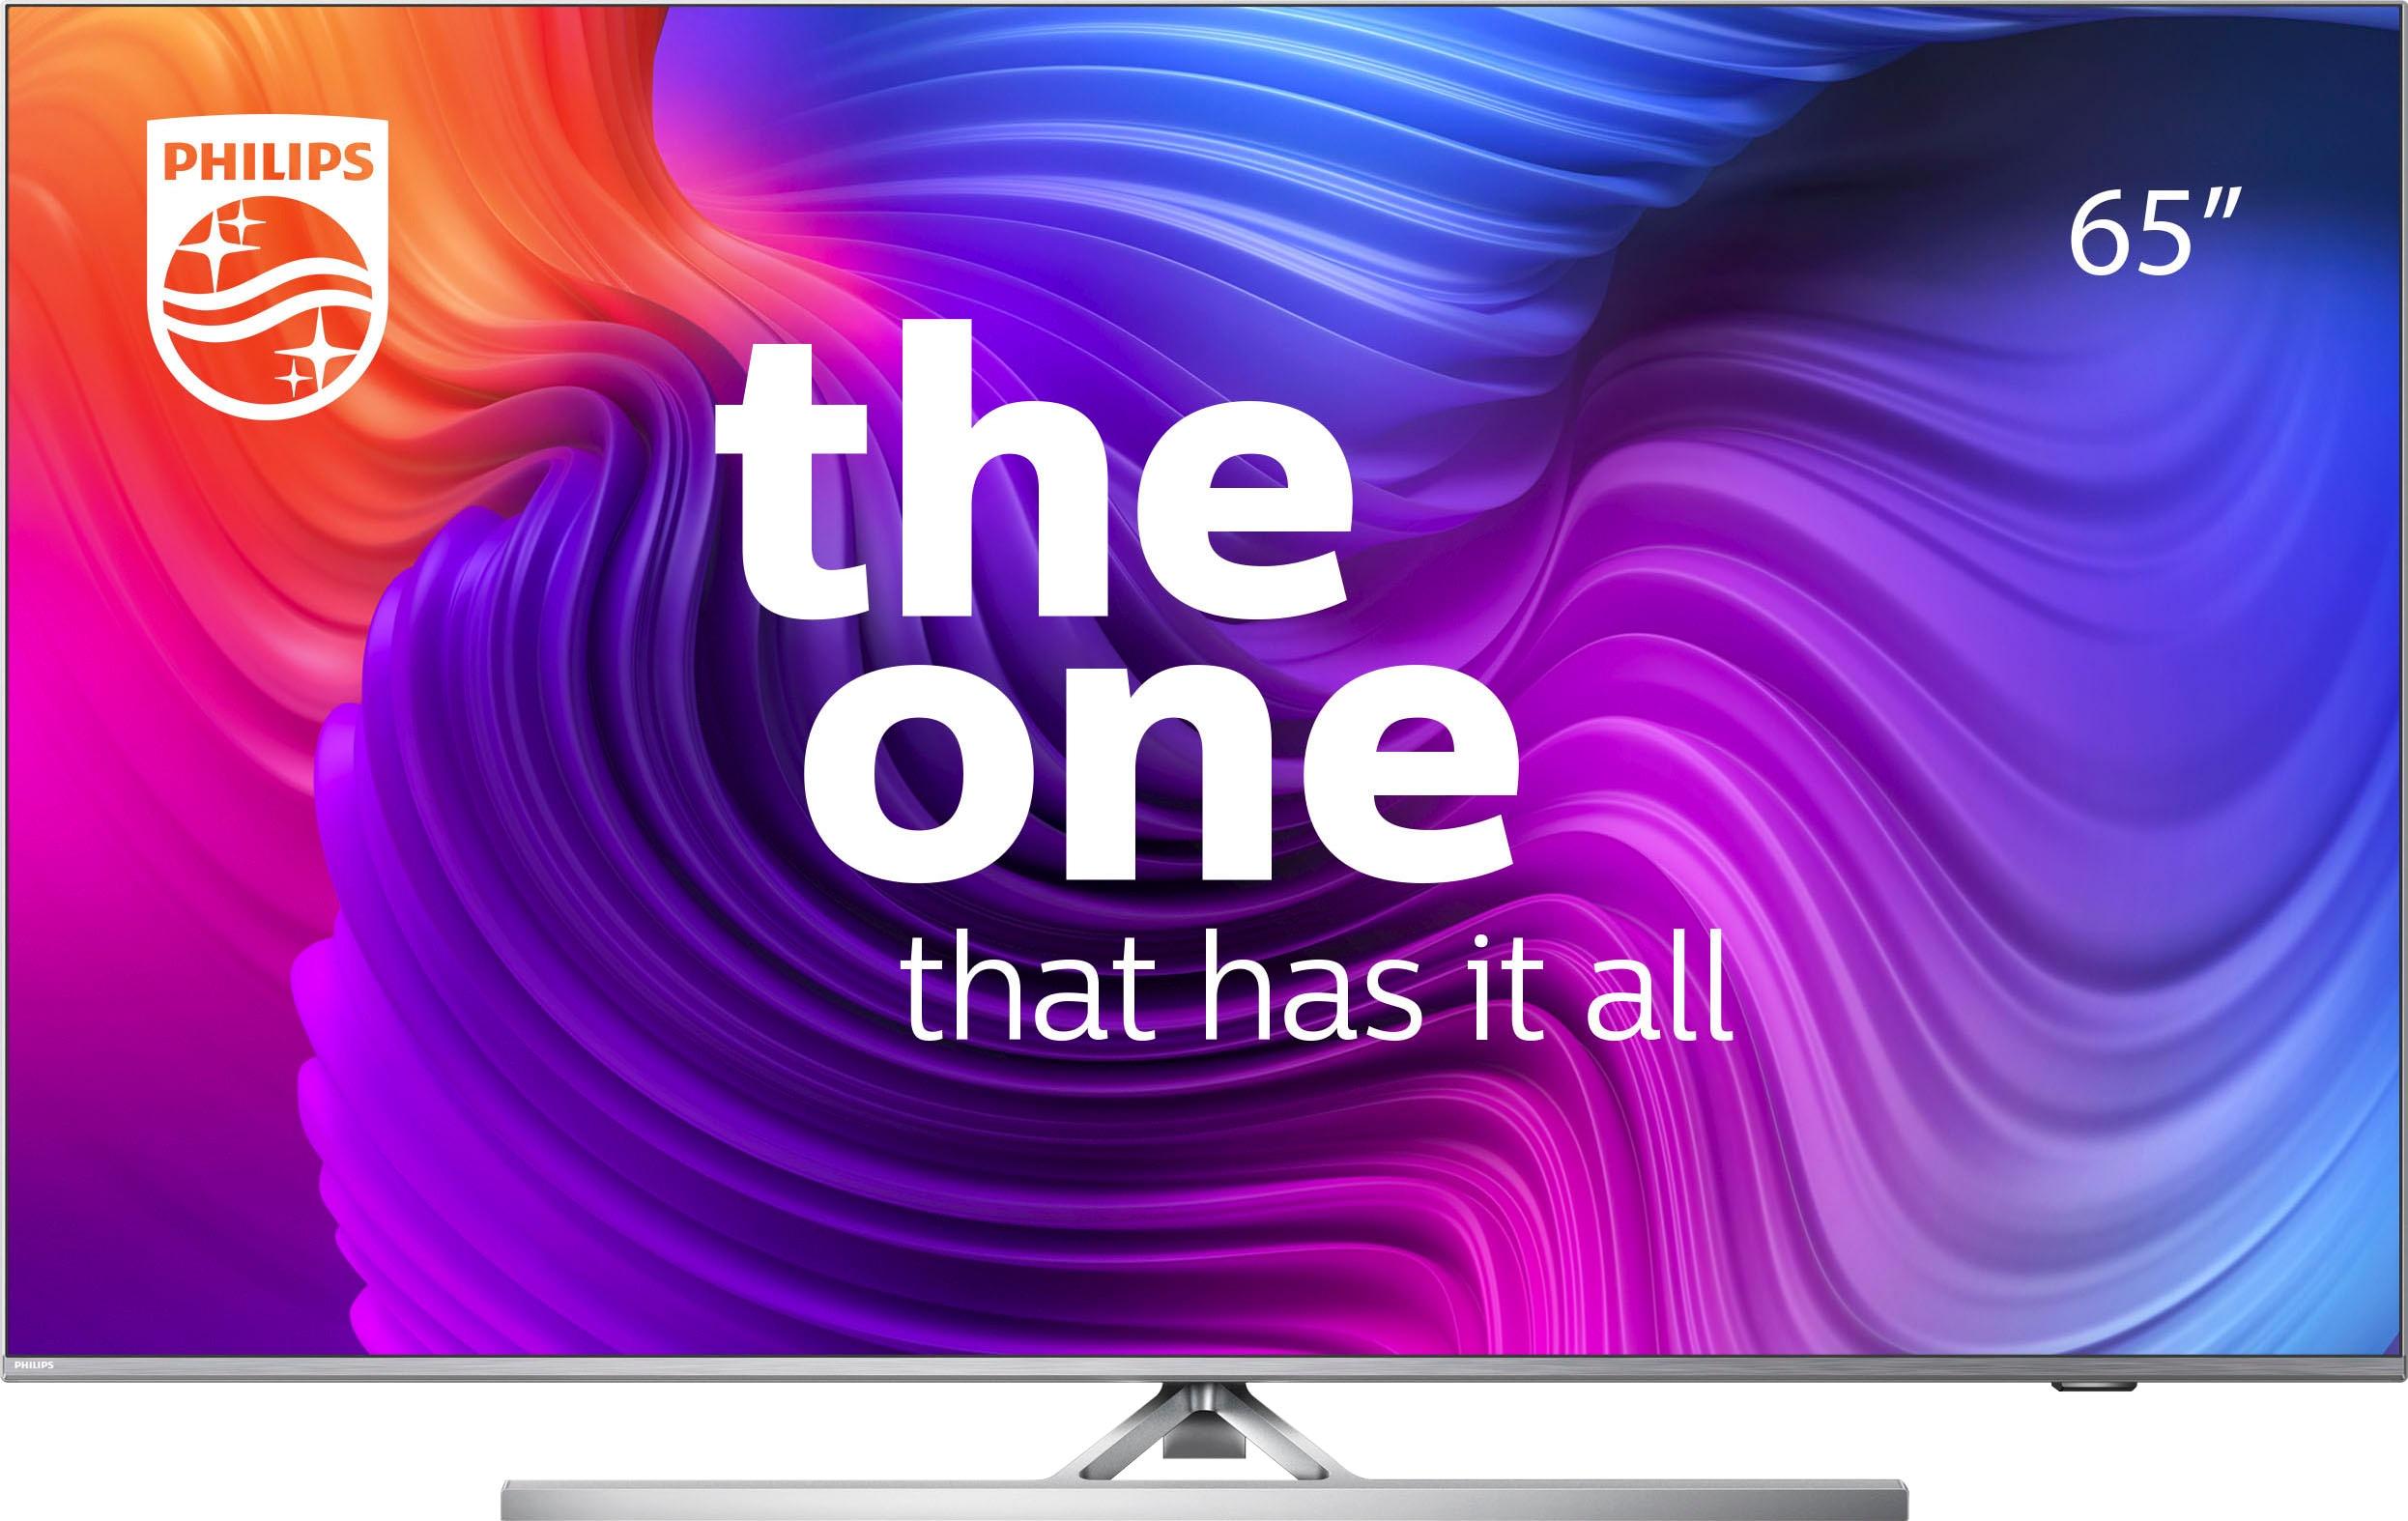 Philips LED-Fernseher 65PUS8506 12 , 164 cm 65 , 4K Ultra HD, Smart-TV